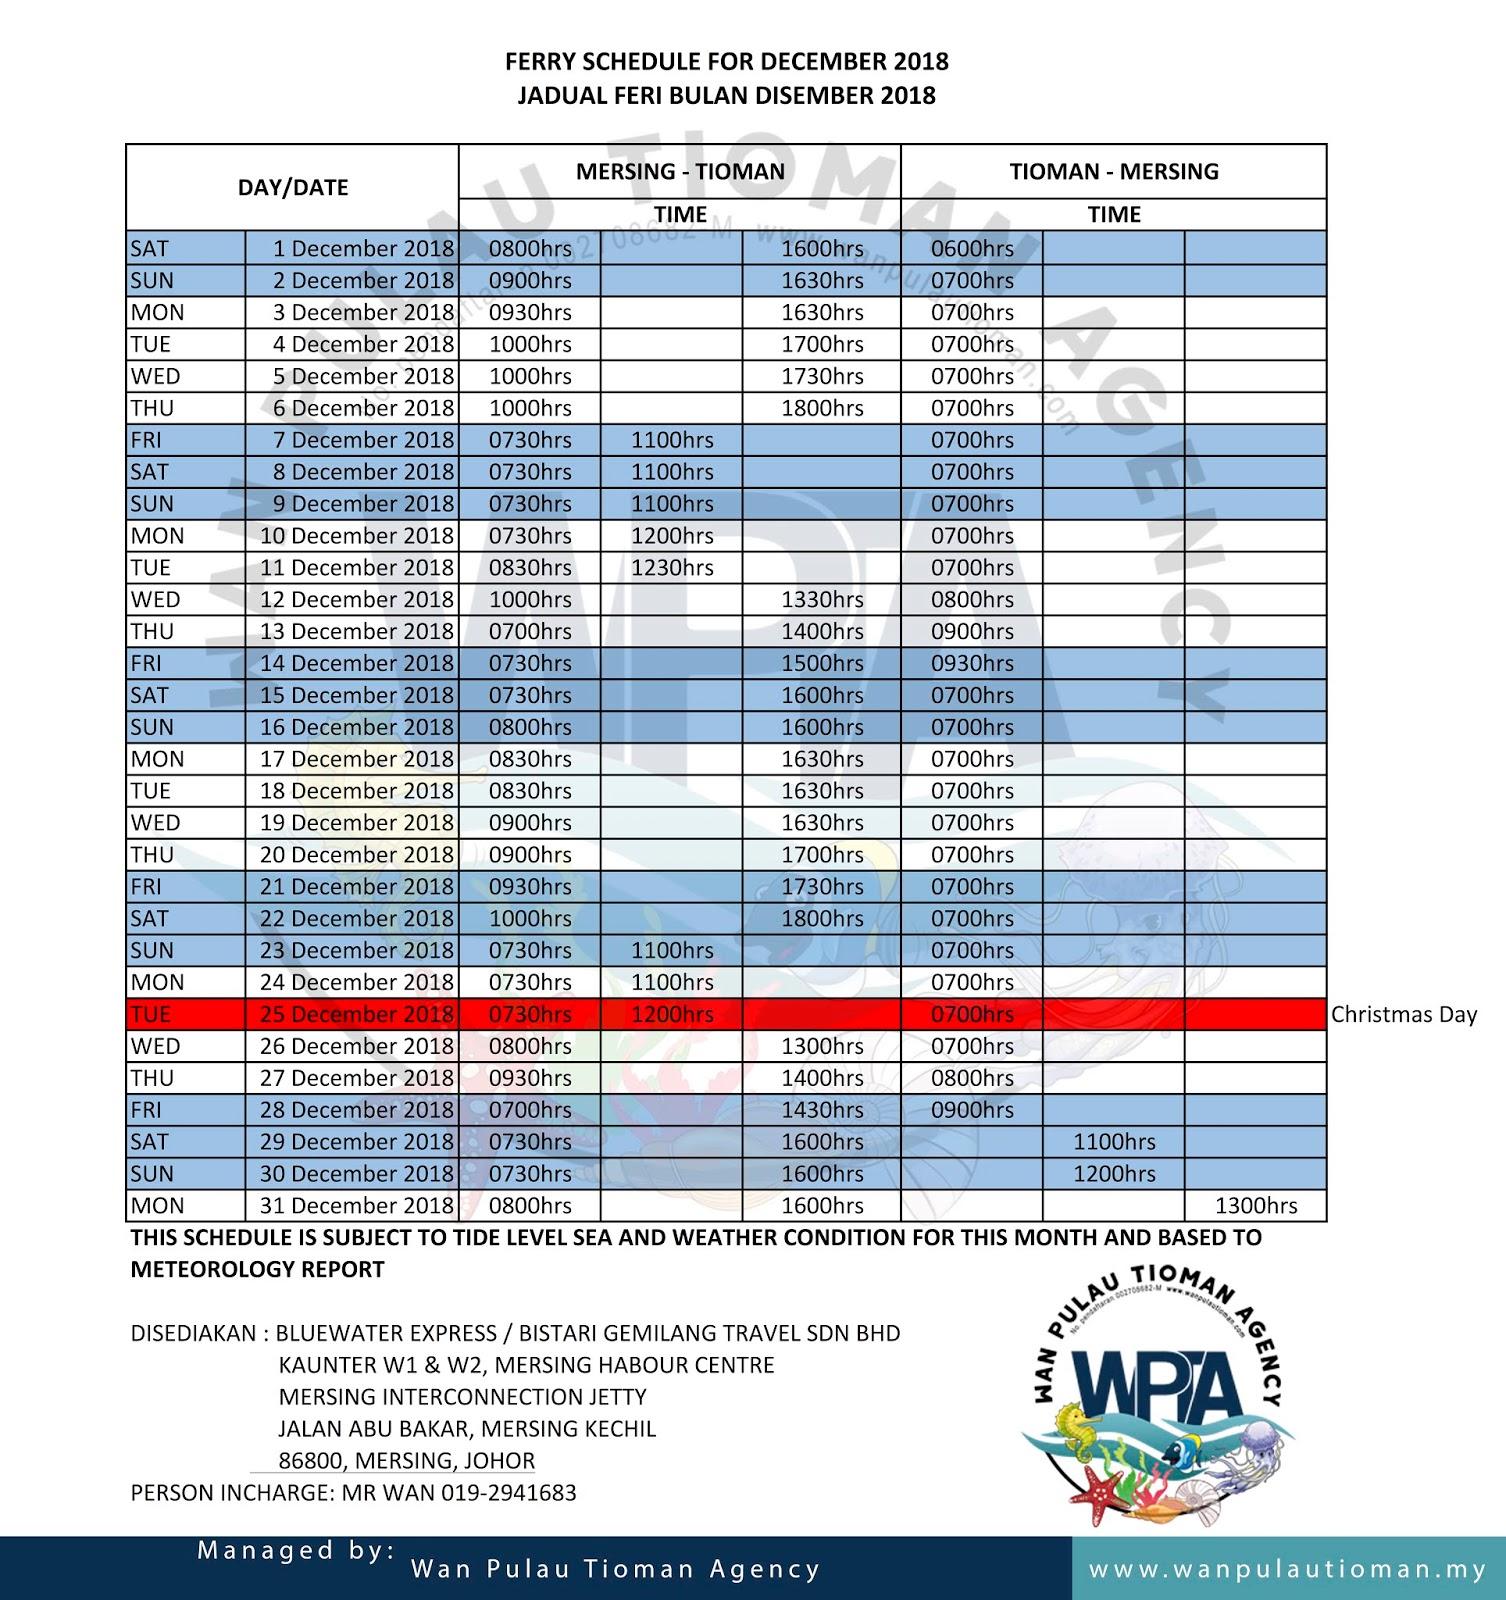 Tioman Ferry Transfer Schedule December 2018